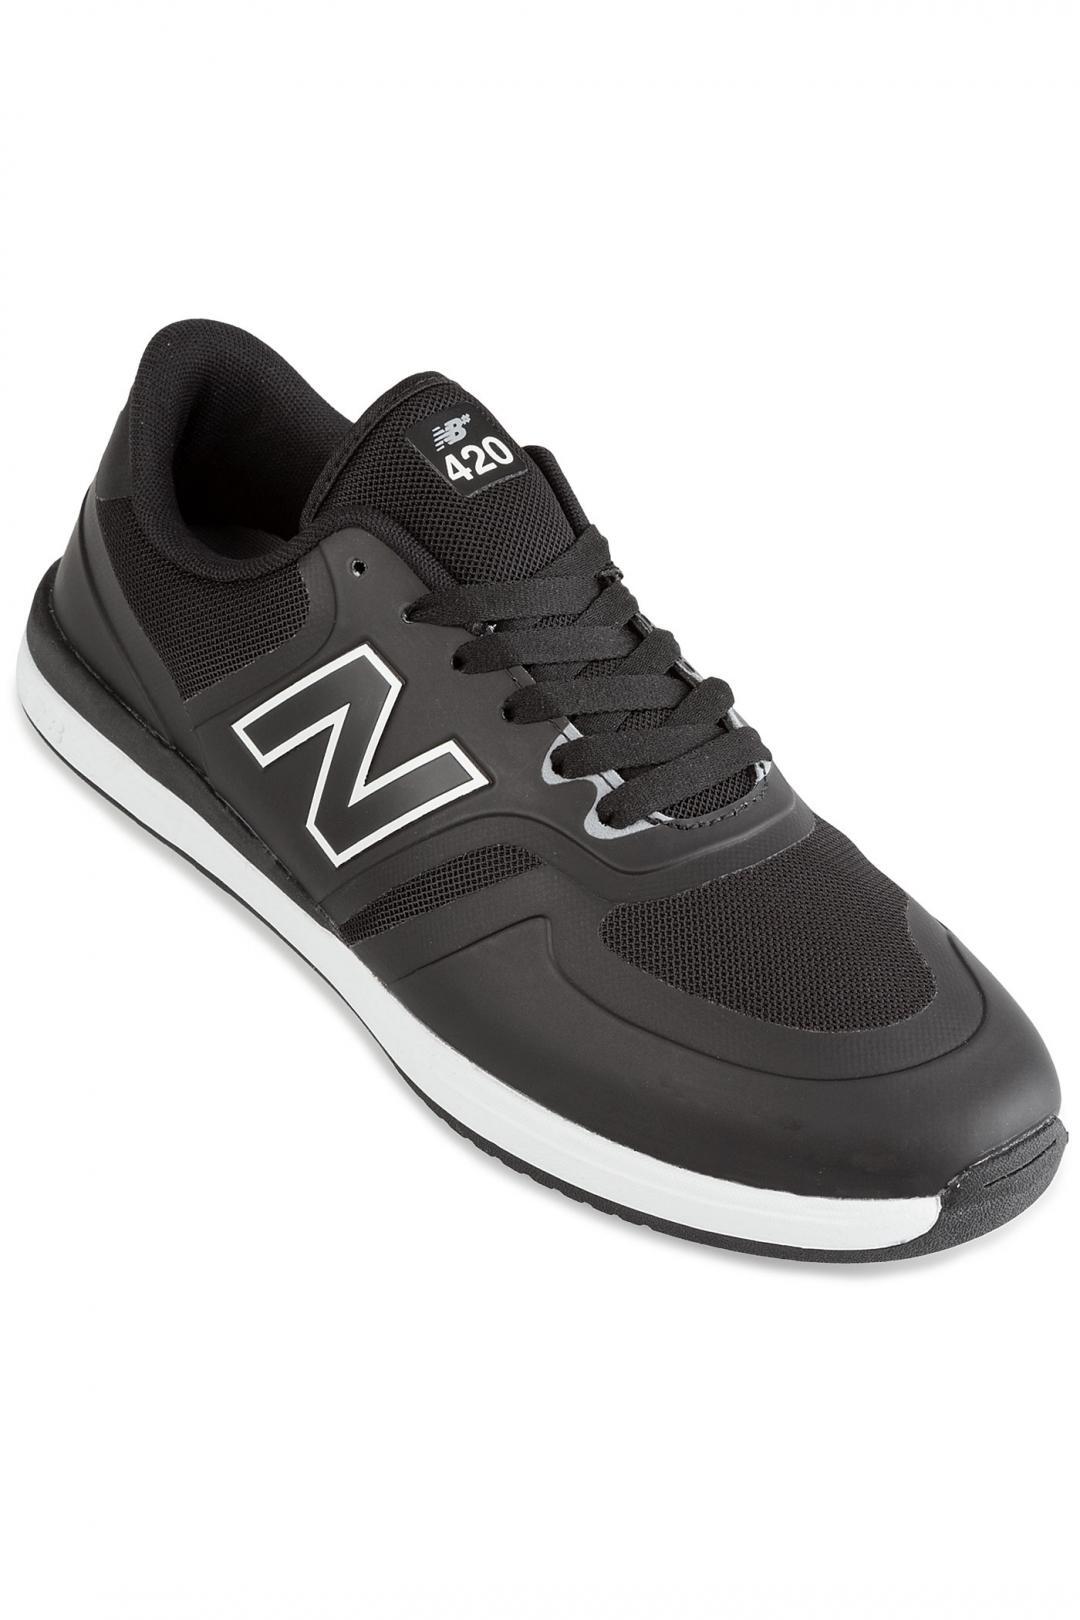 Uomo New Balance Numeric 420 black white | Sneakers low top